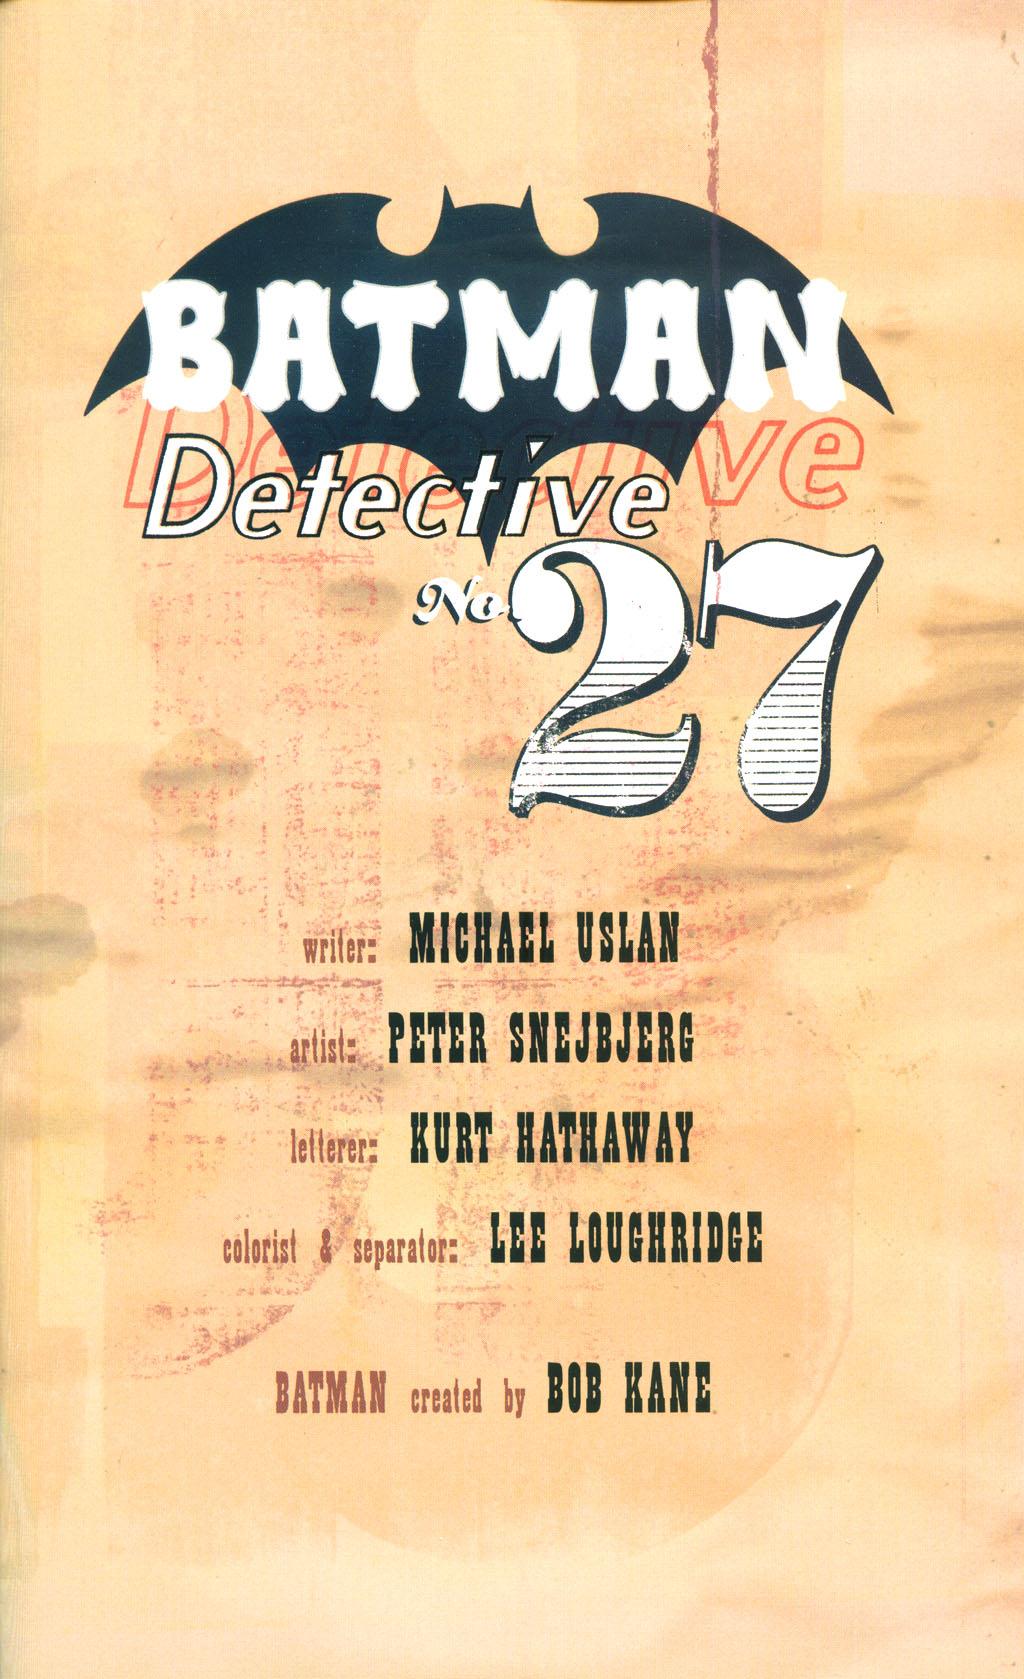 Read online Batman: Detective #27 comic -  Issue #27 TPB - 5